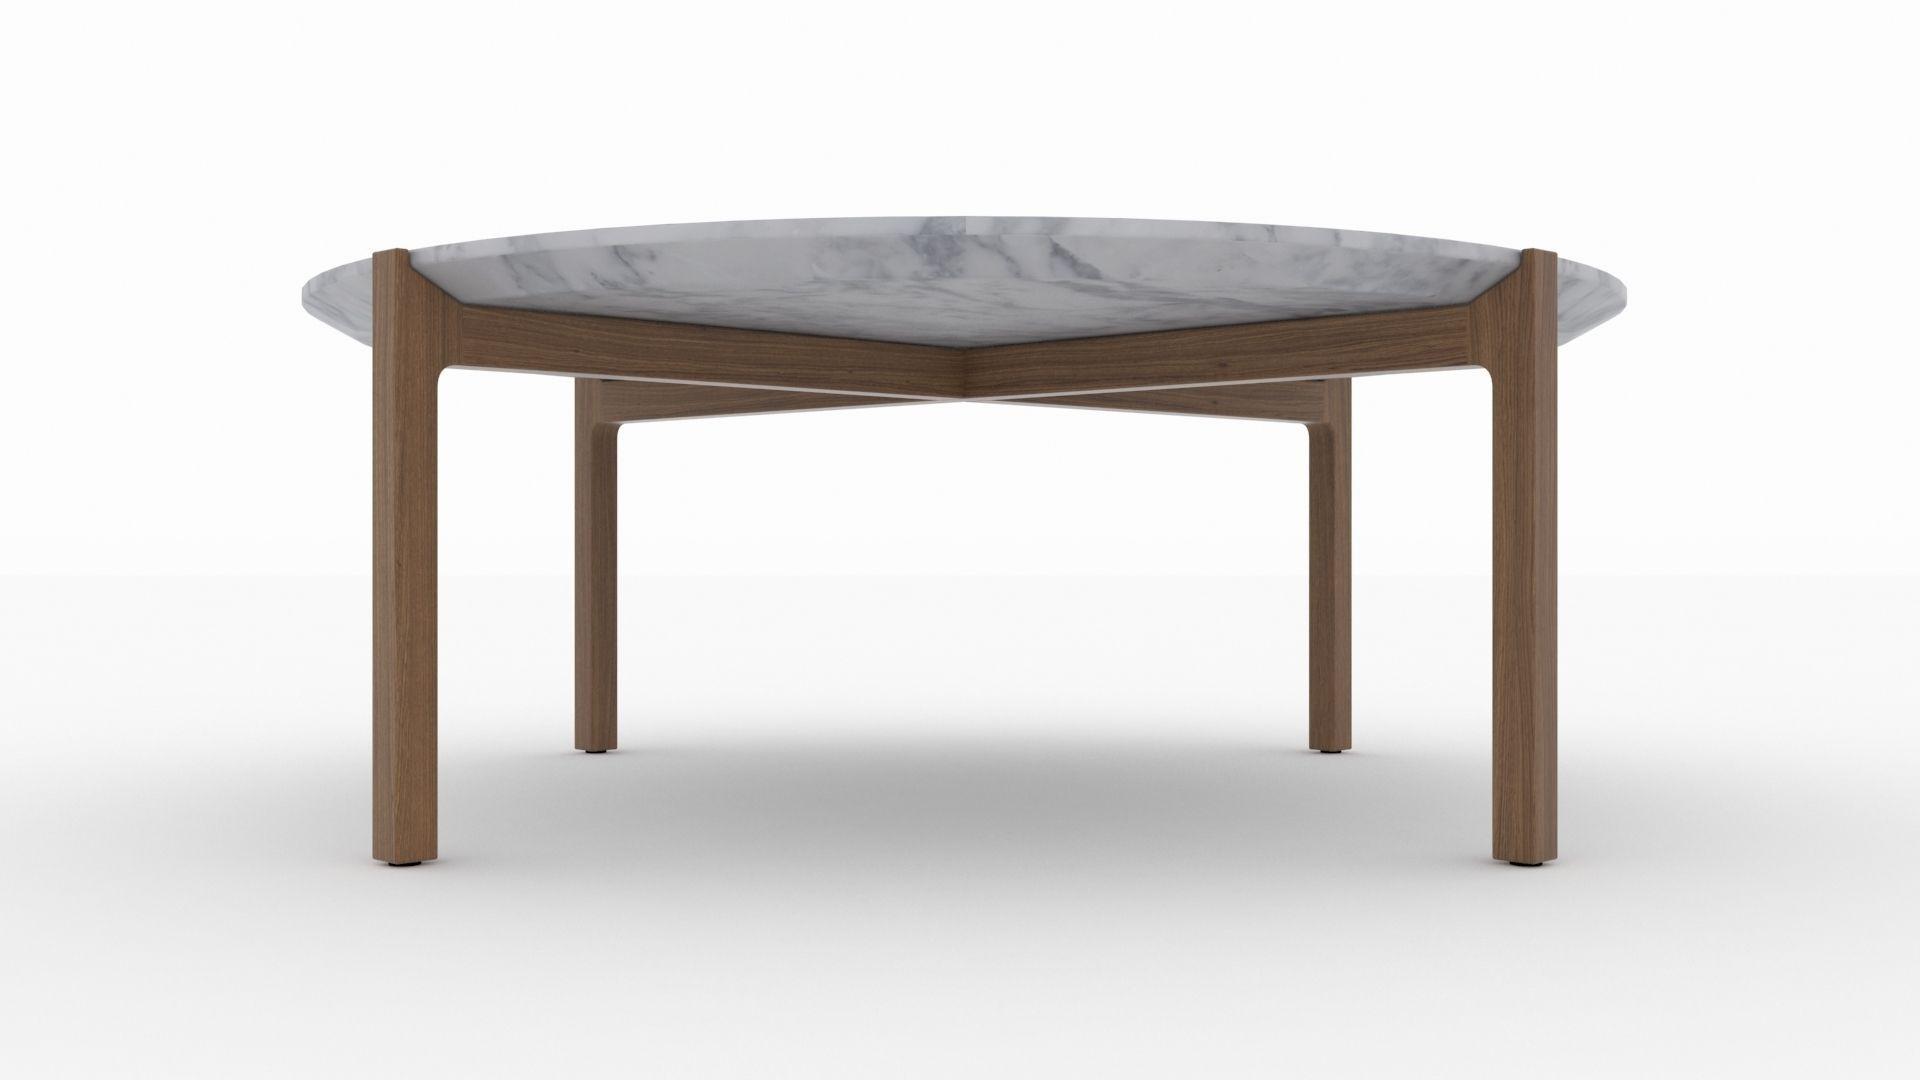 Kendo Lotta Coffee Table Free 3d Model Max Obj 3ds Mtl